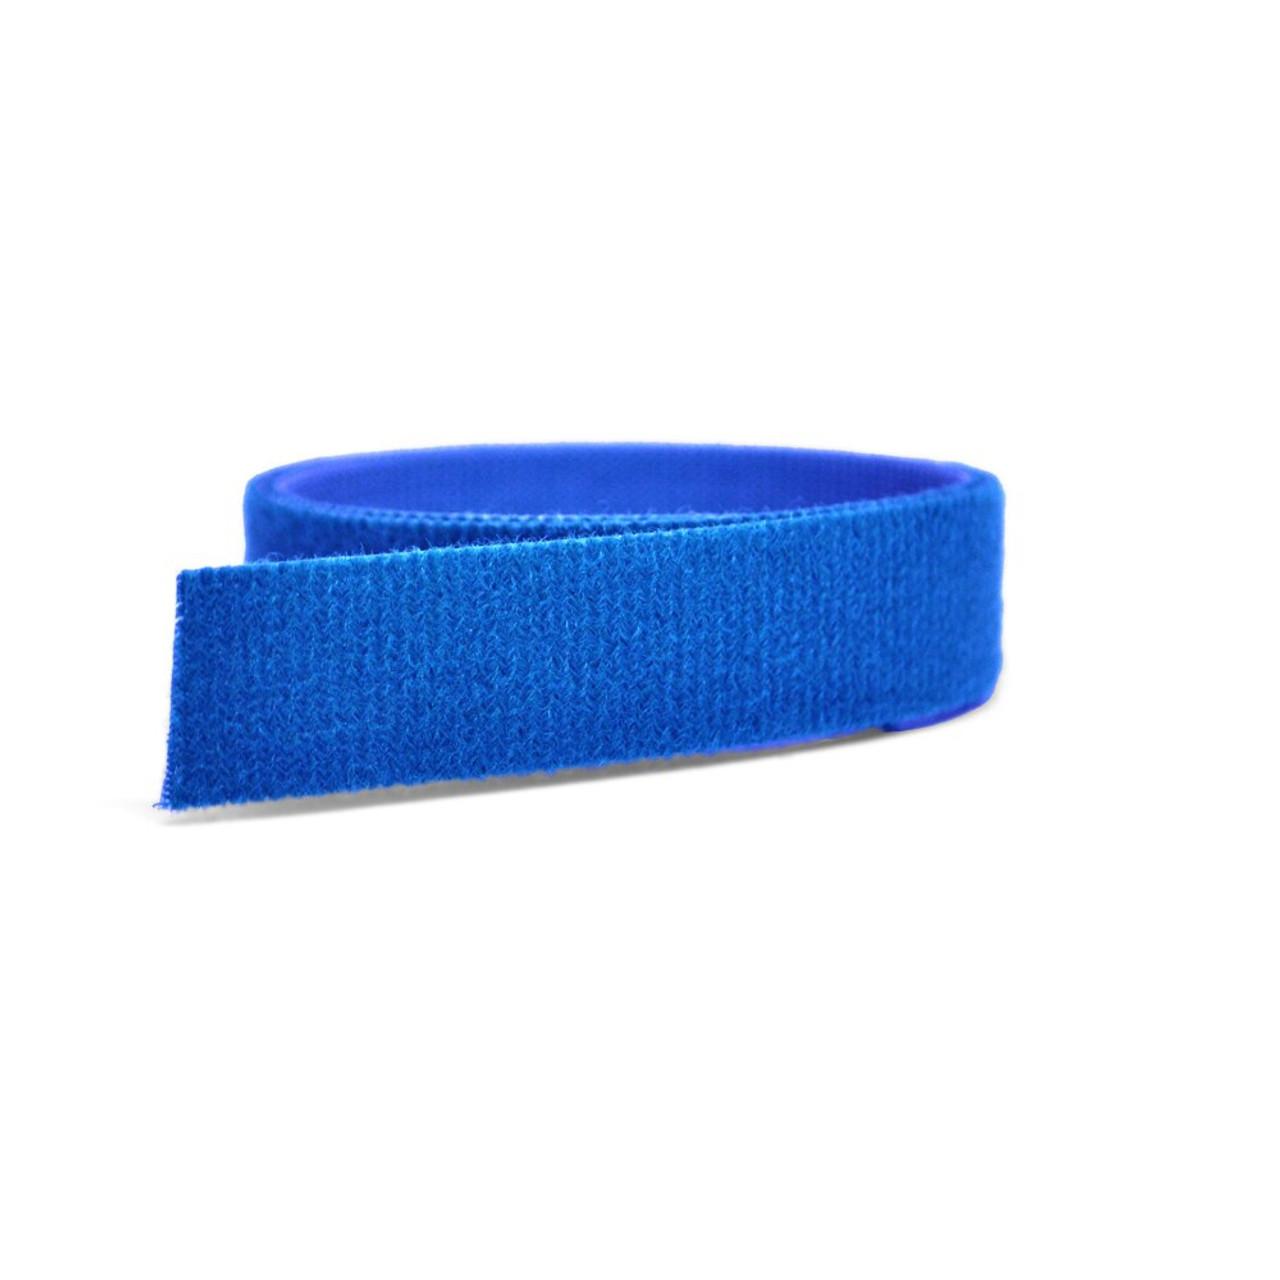 VELCRO® ONE-WRAP® Tape - Blue / Velcro Straps - Bundling Straps - Velcro Tie - Velcro Strap